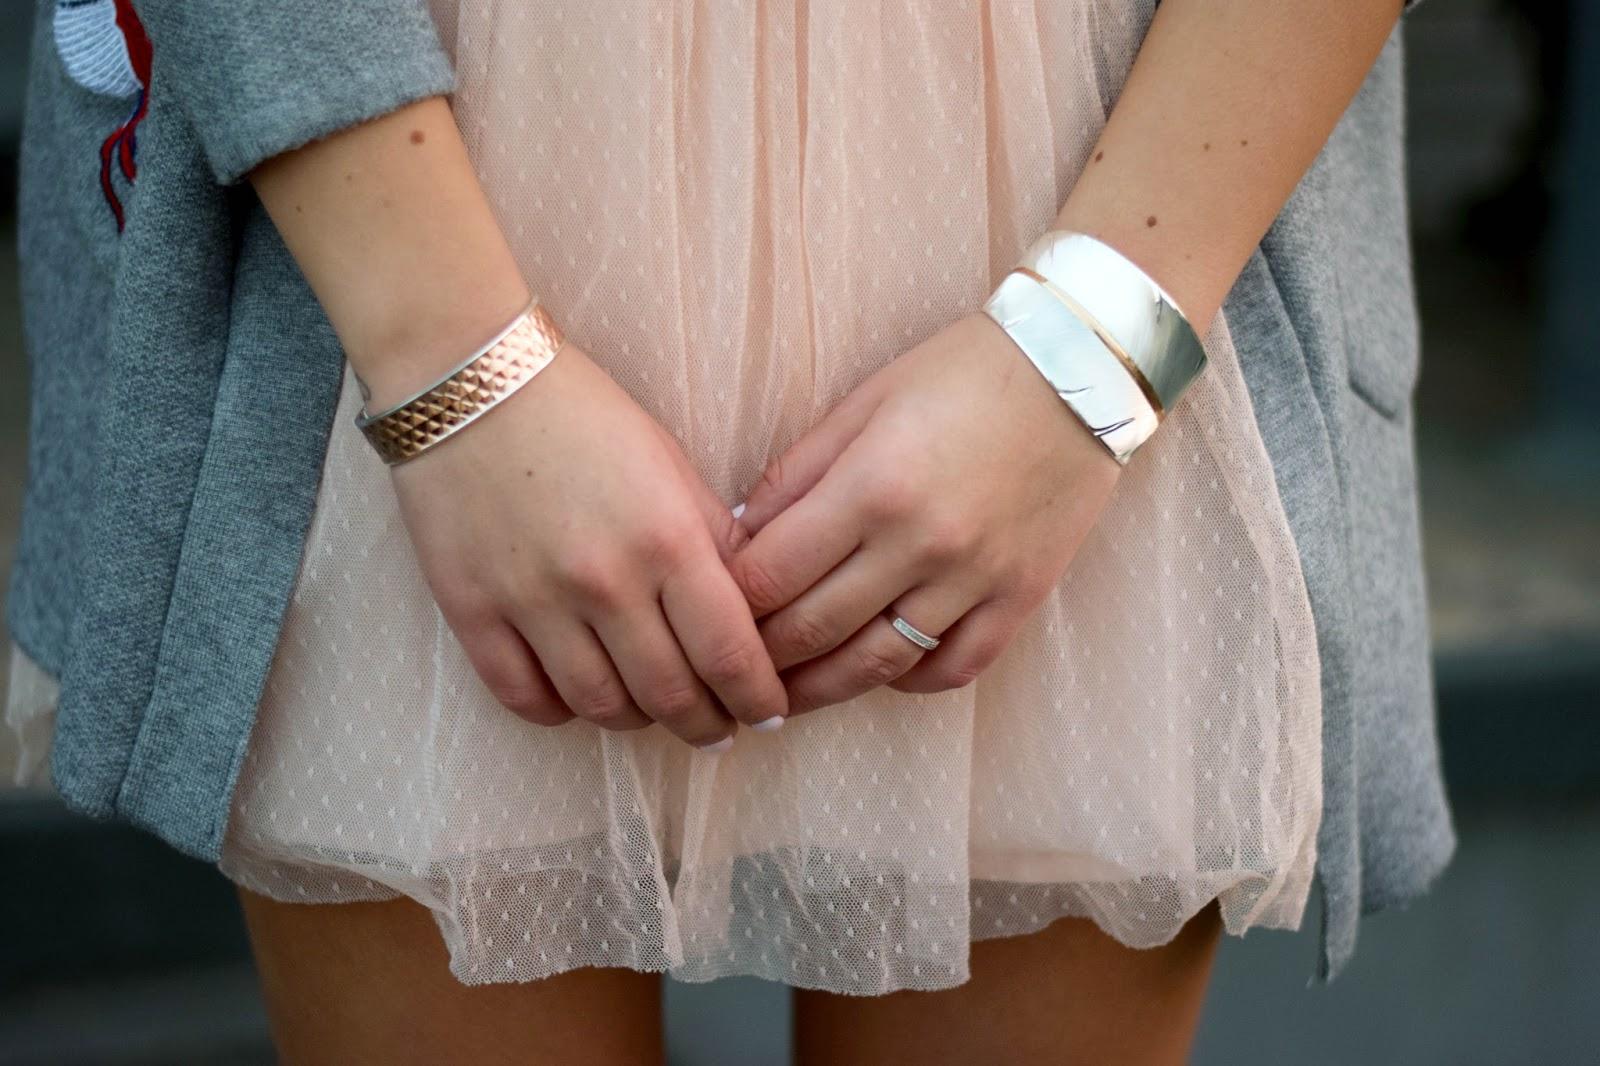 Montana silversmith, german blondy, christmas gifts, jewelry, bracelet, cuff bracelet